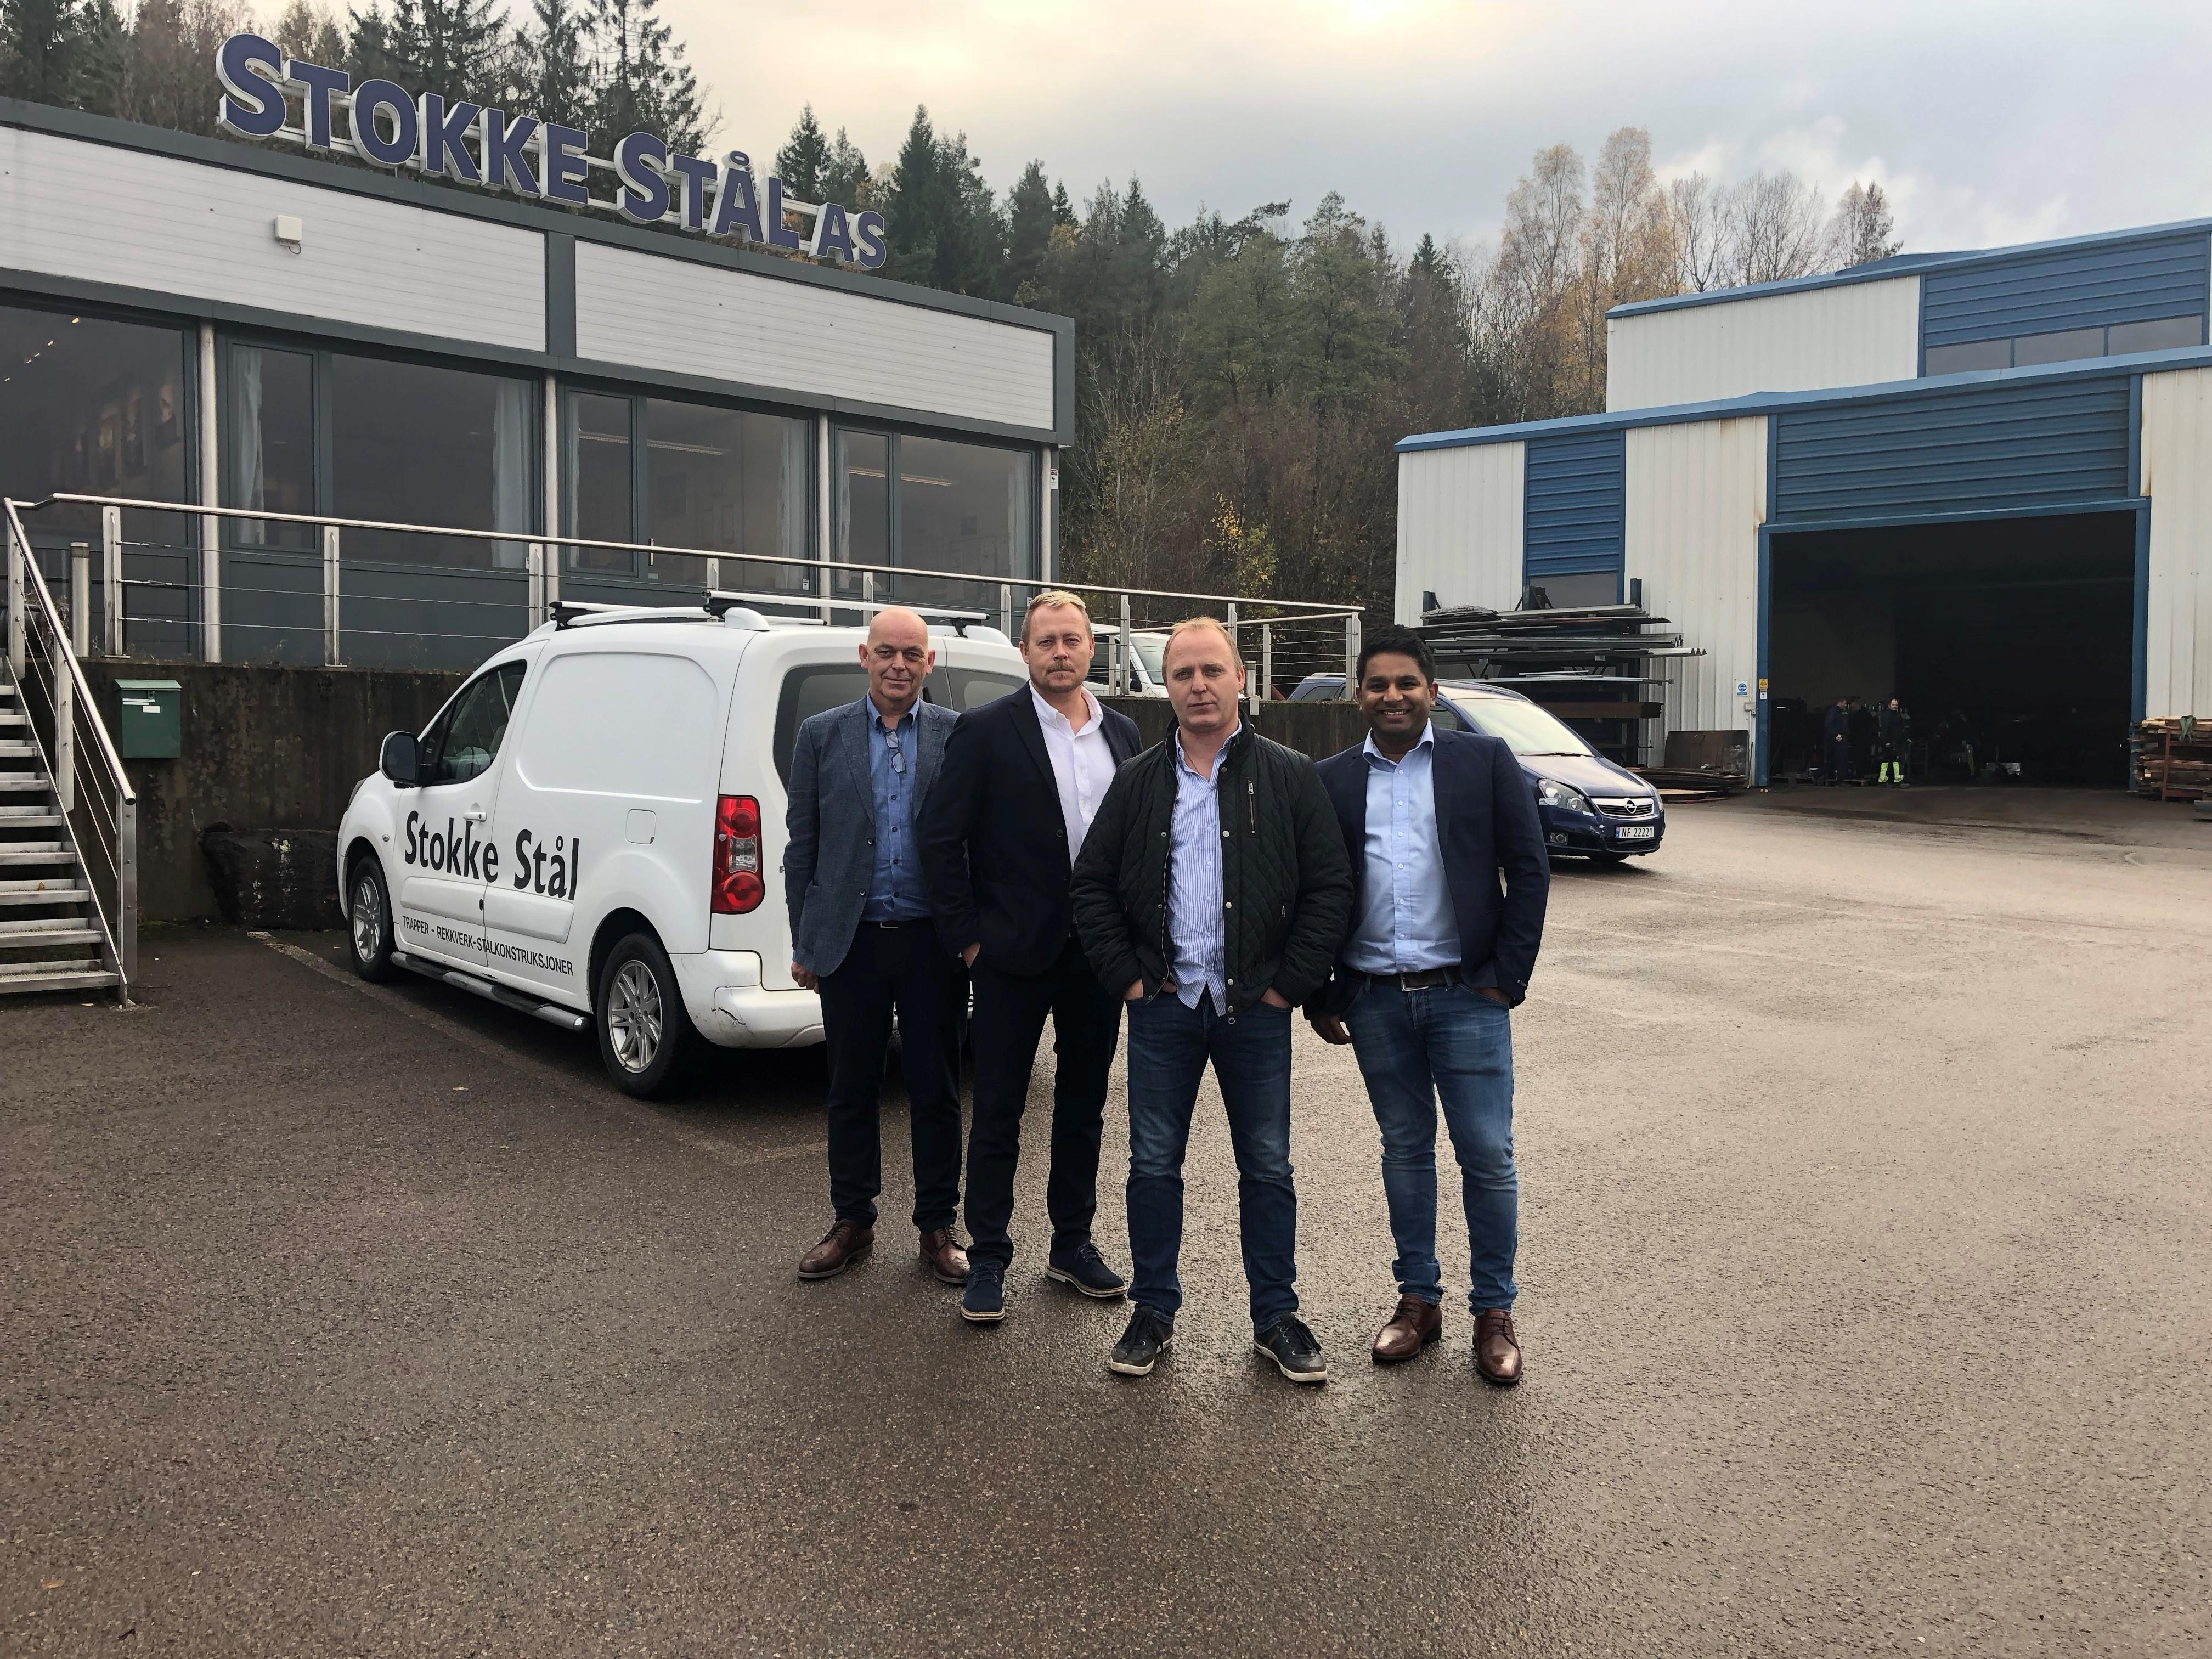 PCS Holding kjøper Stokke Stål